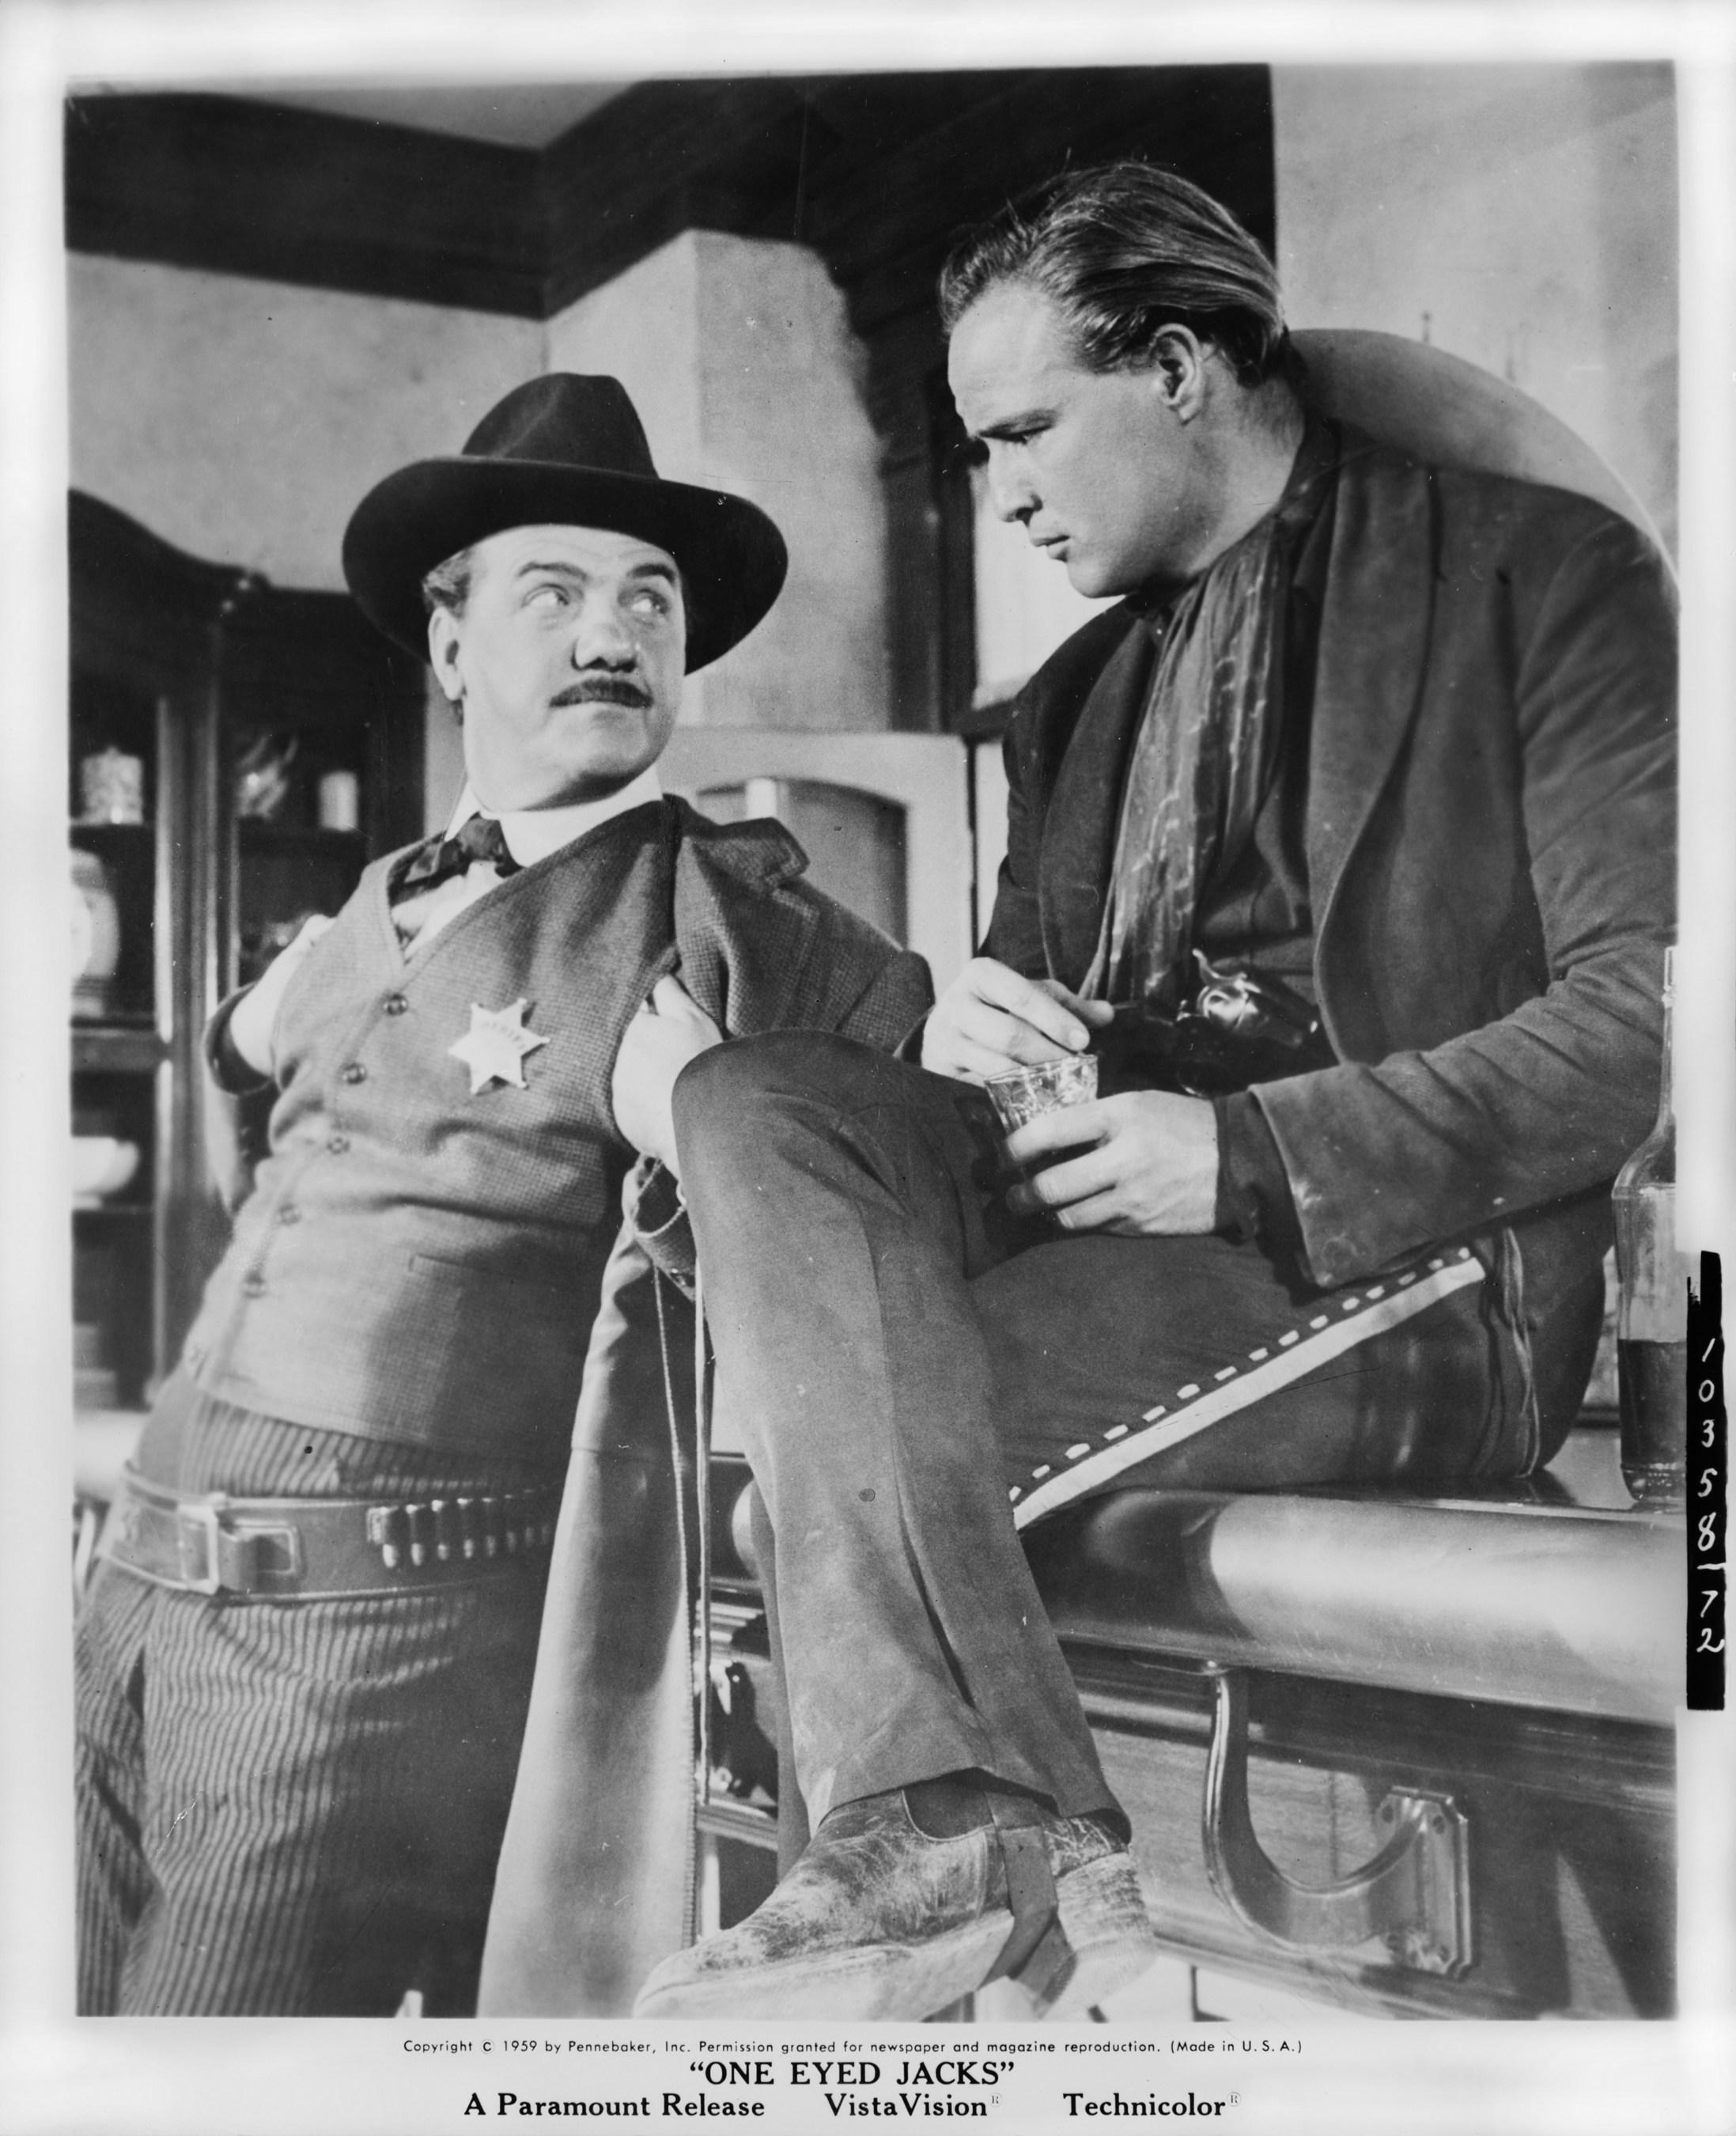 Karl Malden and Marlon Brando in One-Eyed Jacks